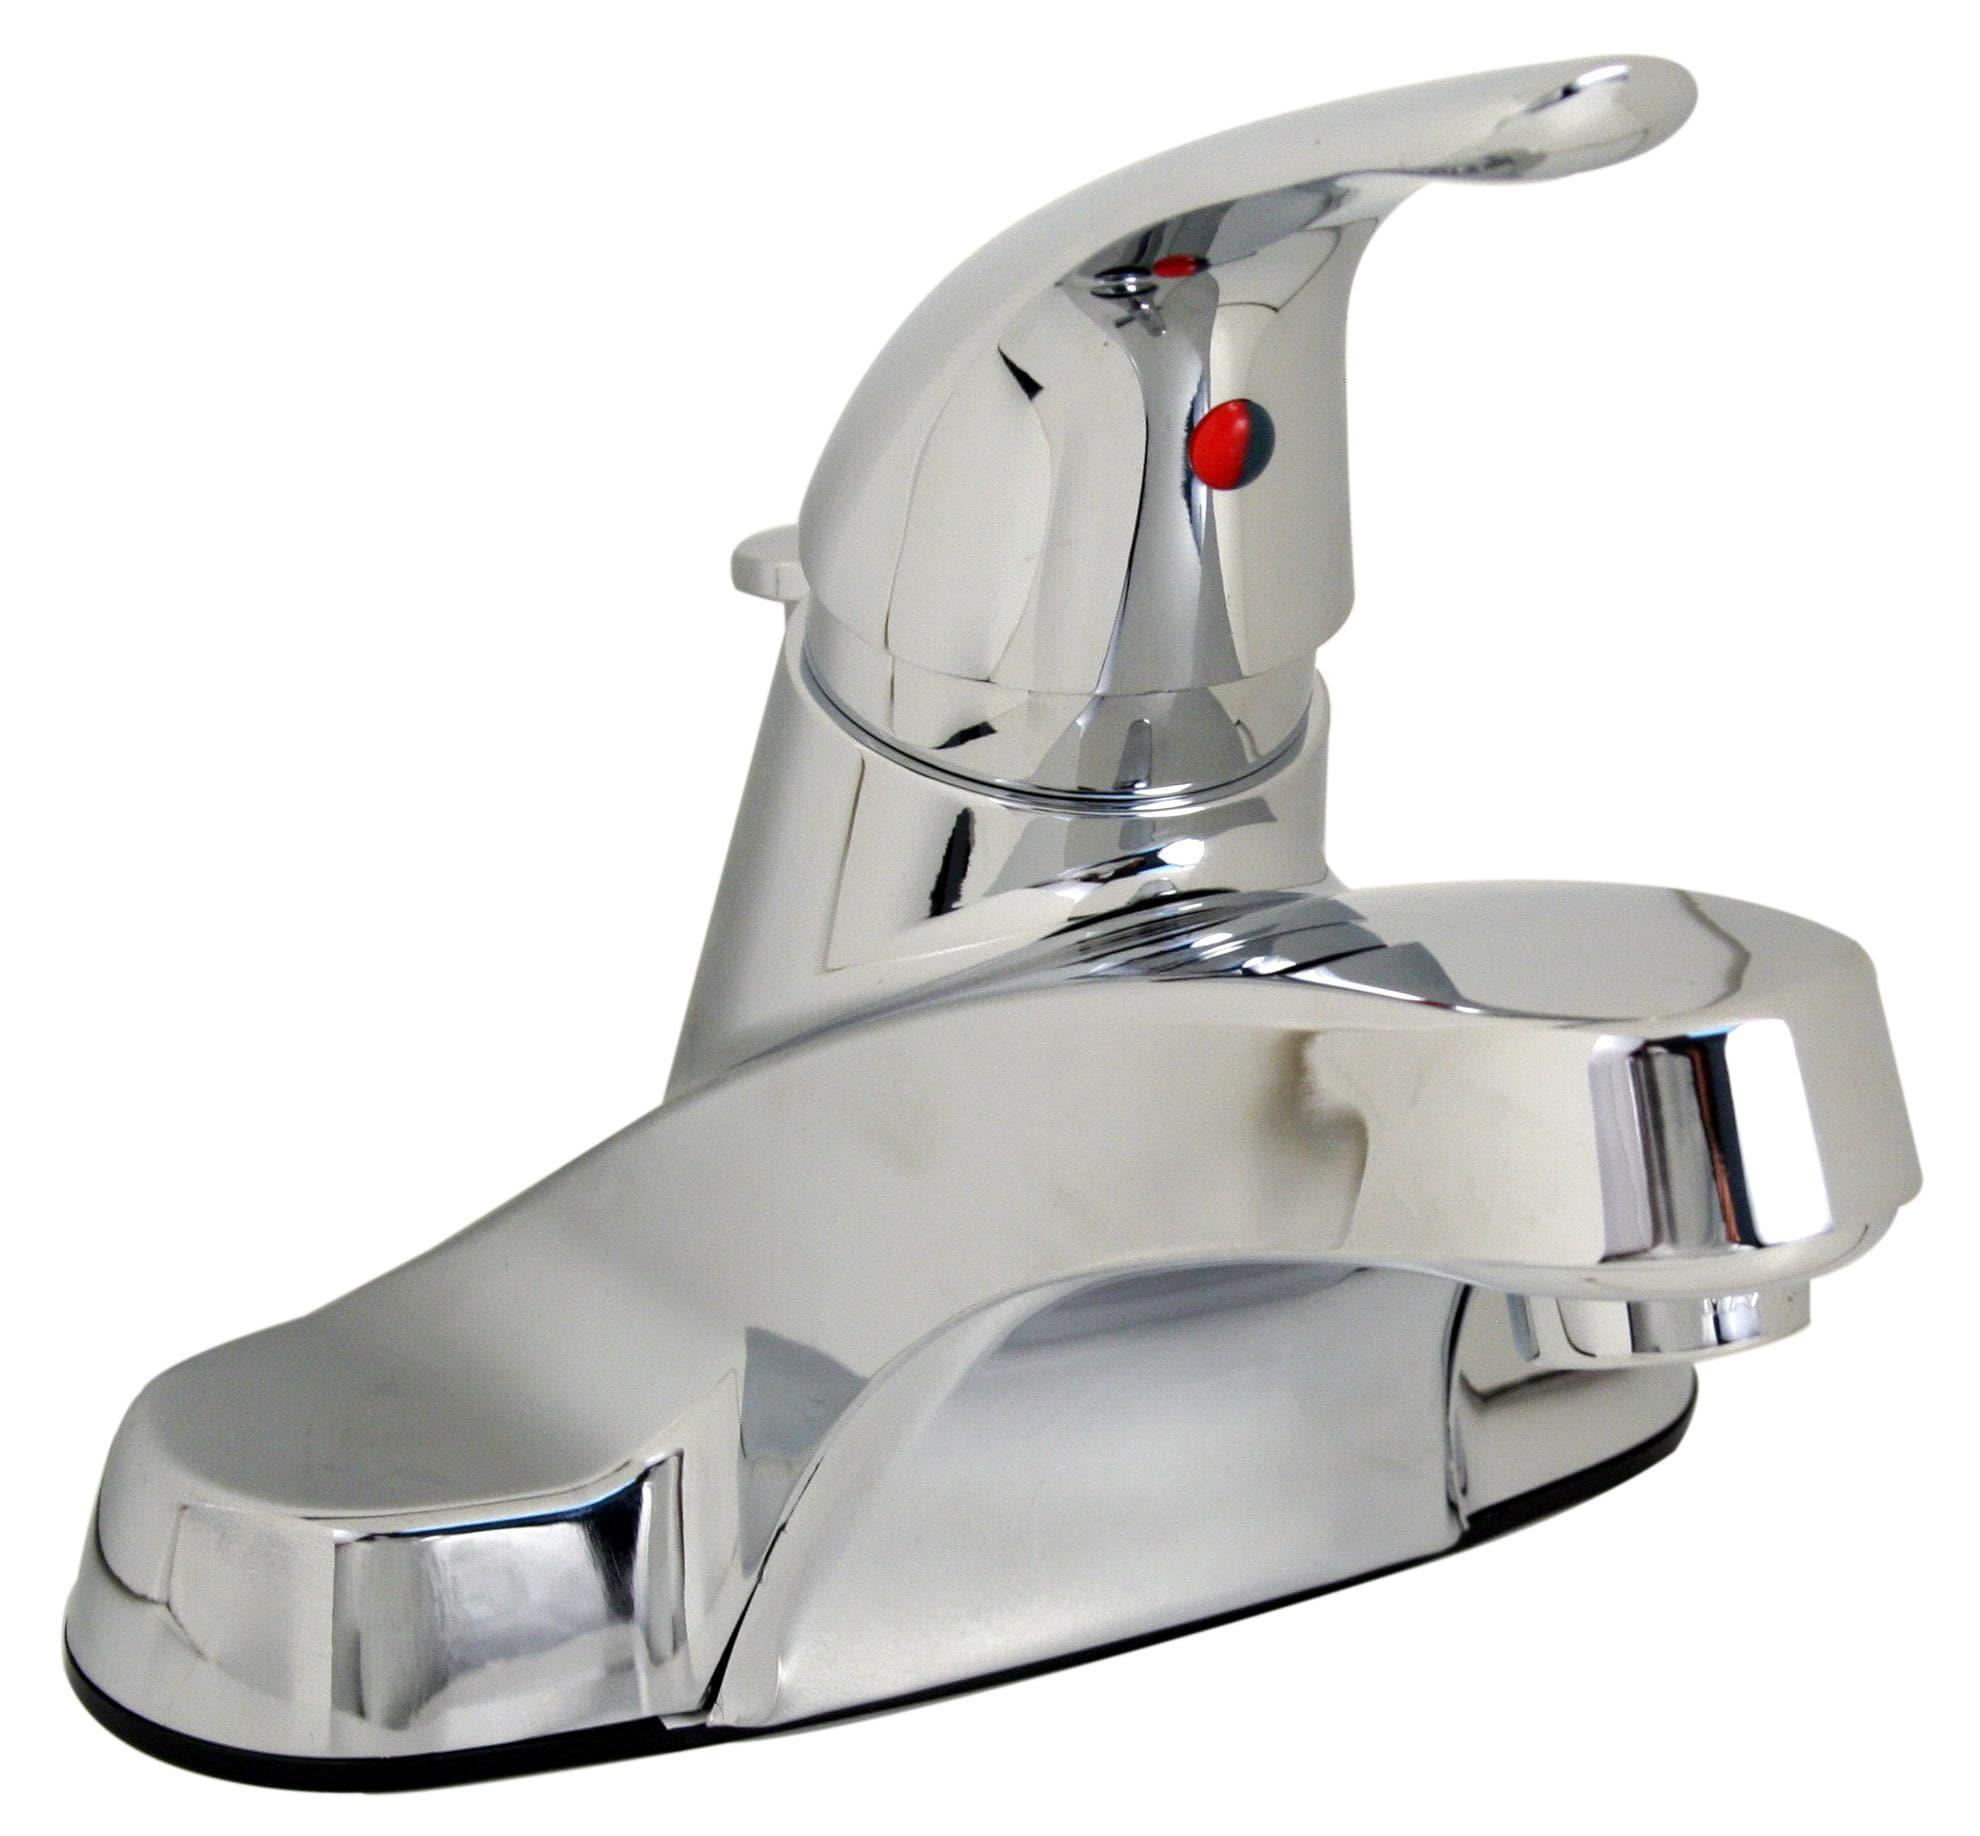 Price Pfister Polished Chrome Centerset Bathroom Faucet